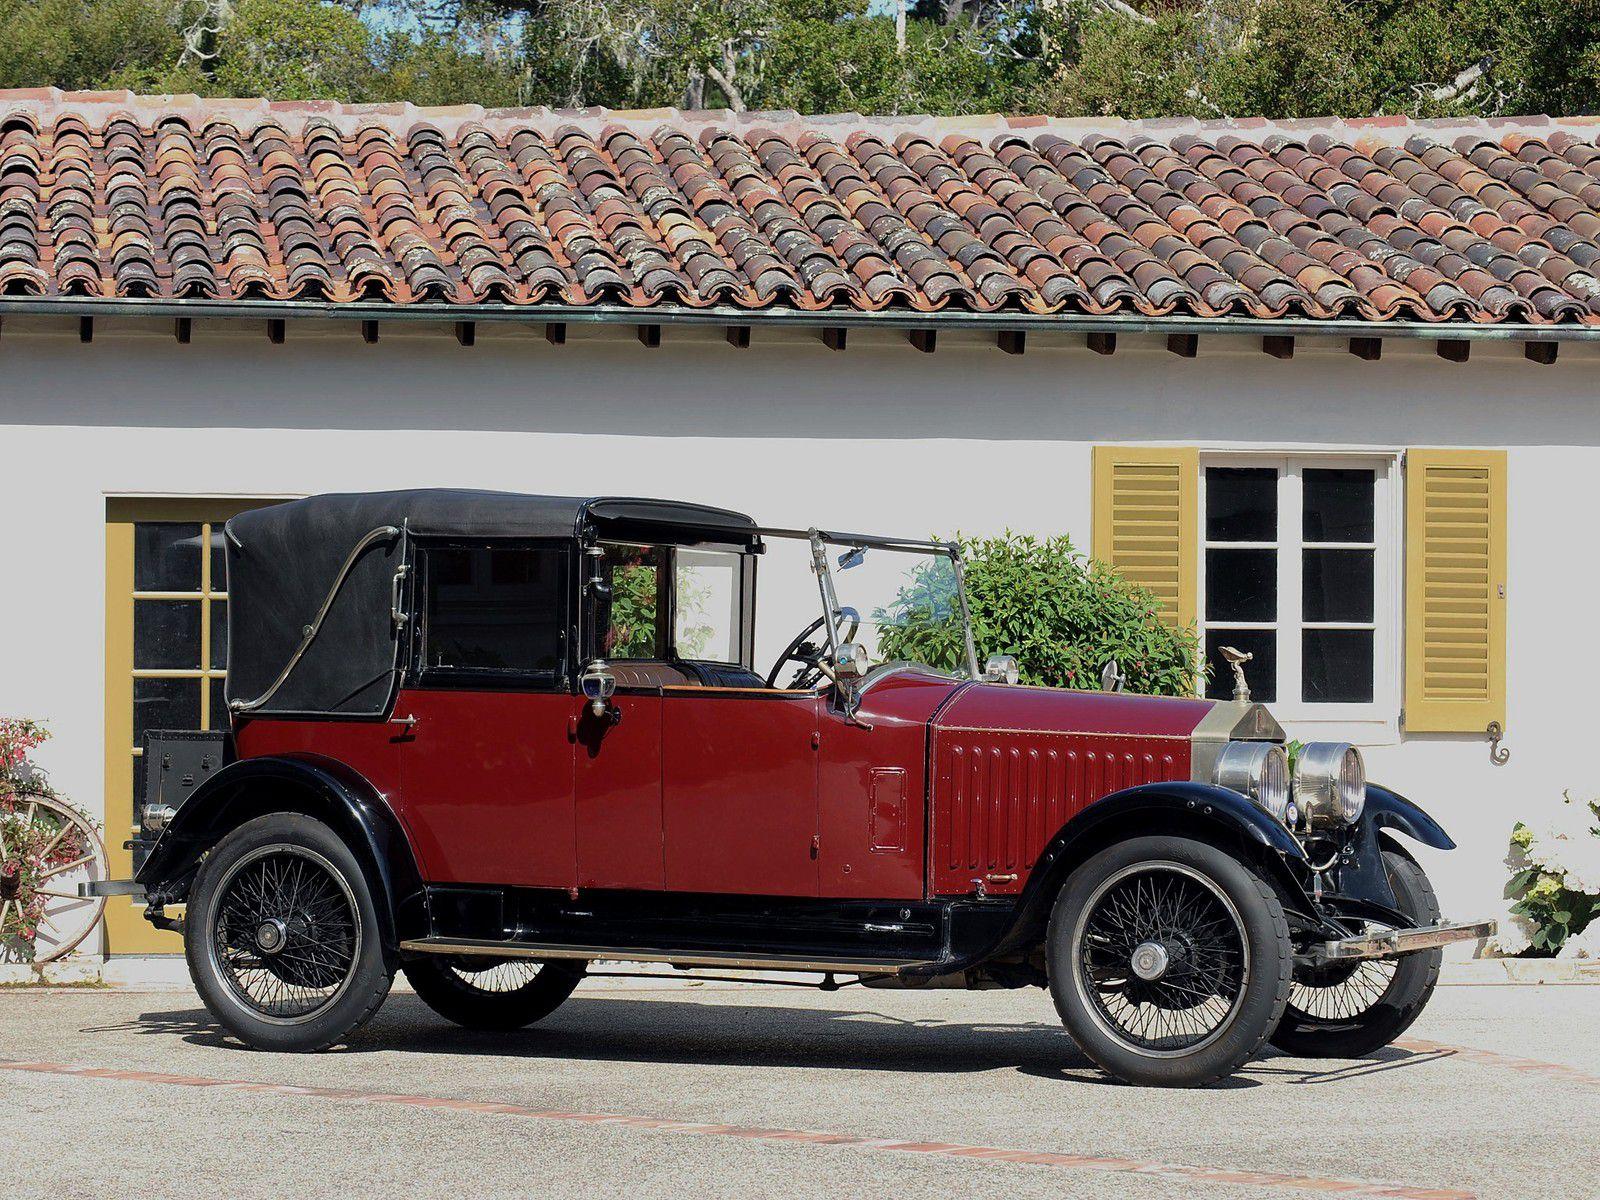 VOITURES DE LEGENDE (1193) : ROLLS-ROYCE  20 HP  SALAMANKA By KELLNER & Cie - 1925